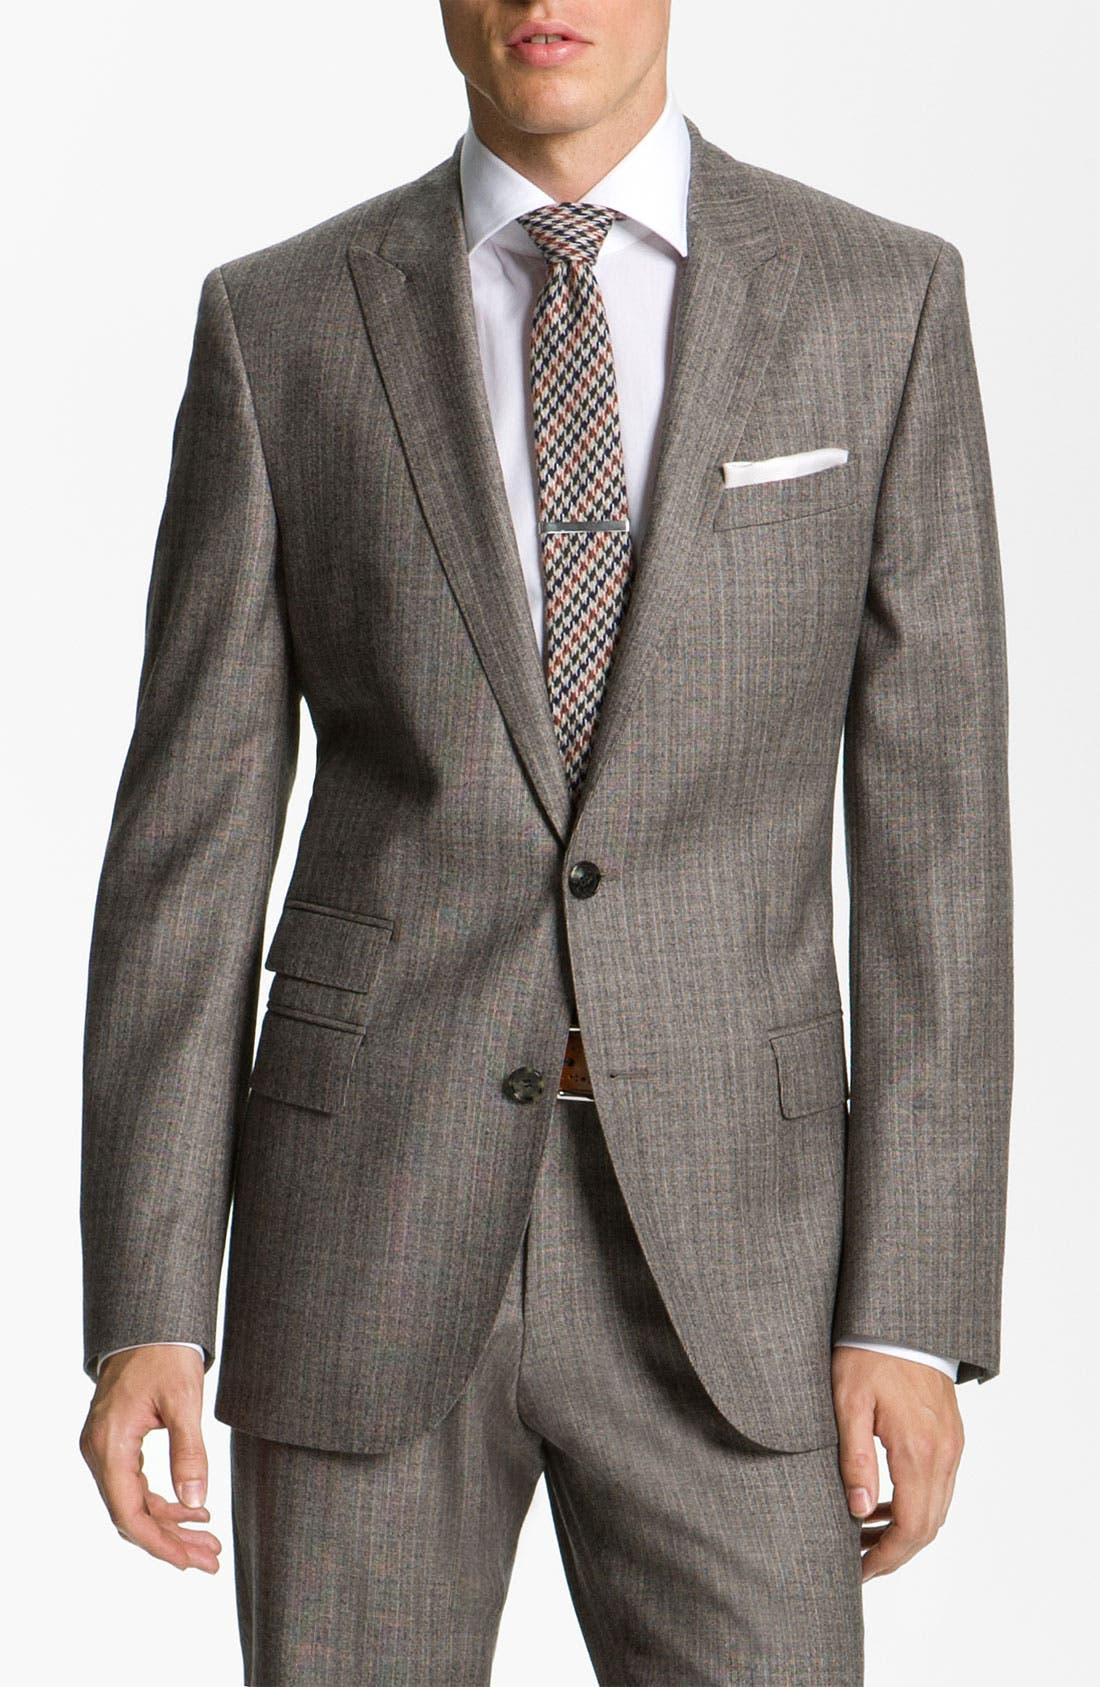 Main Image - BOSS Black Suit & Dress Shirt